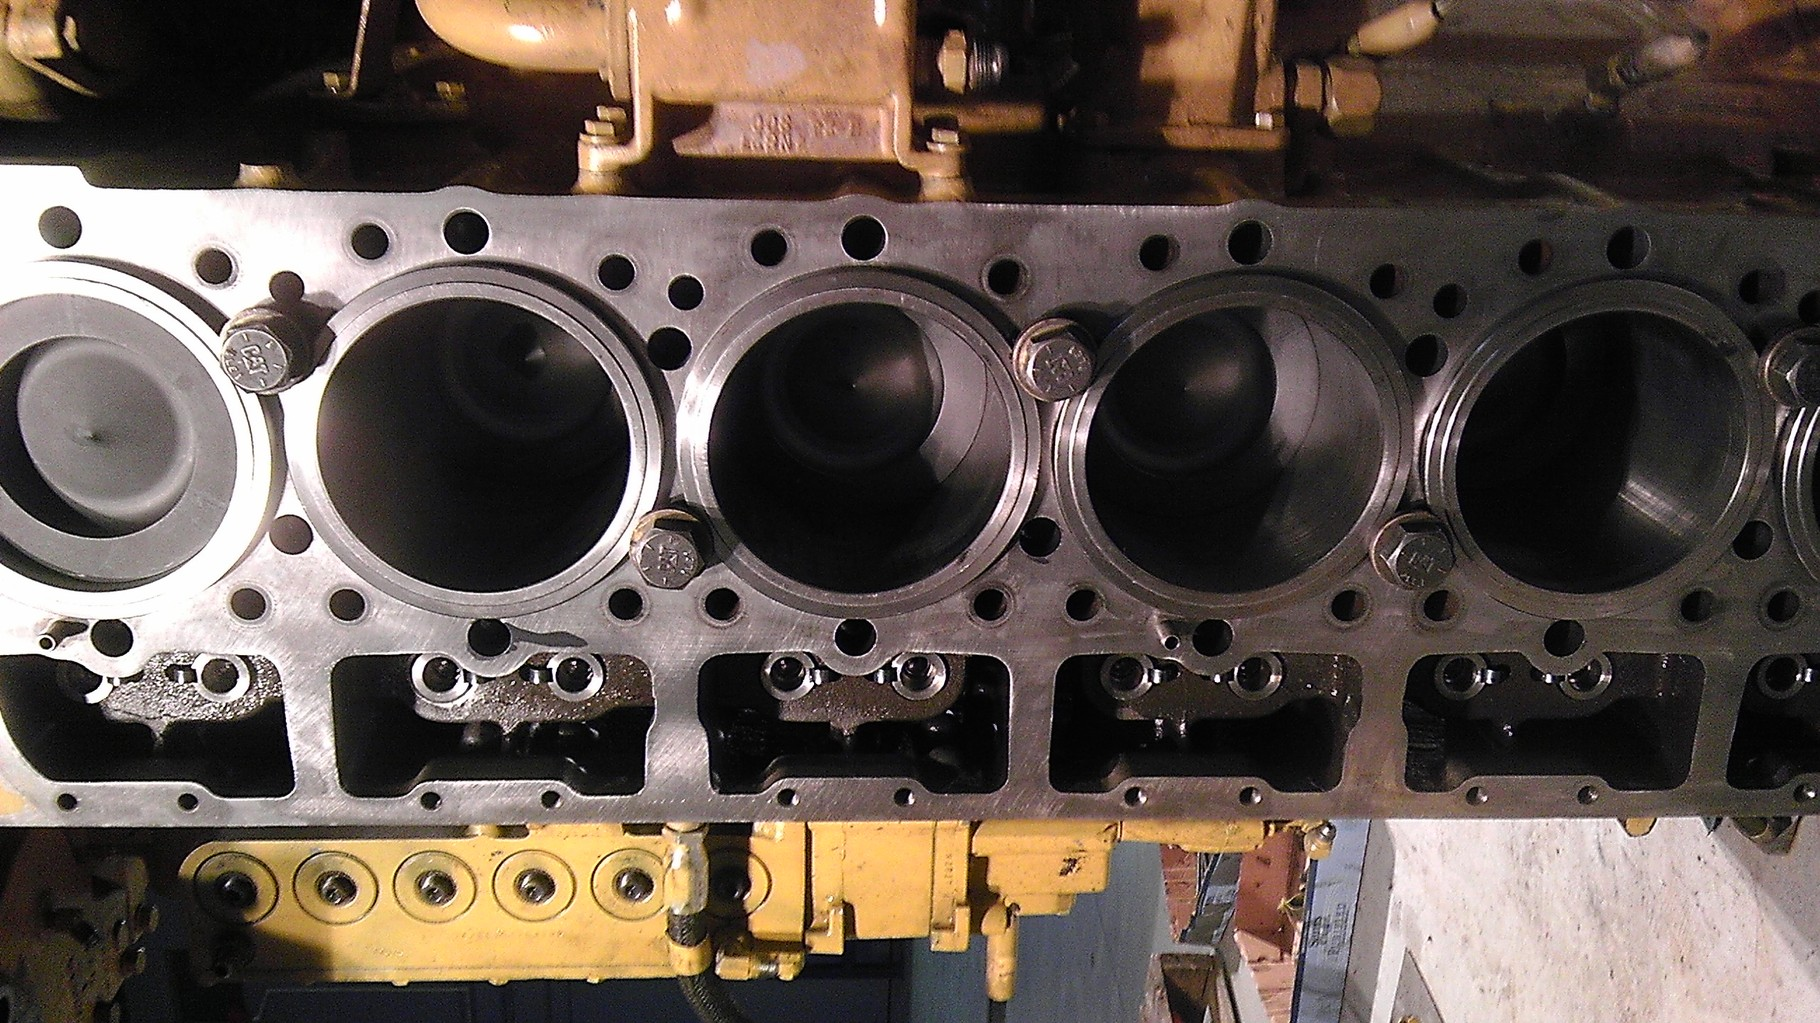 CAT Engine 15.0L Displacement NR Non-Metal Ringless Ceramic Piston Conversion